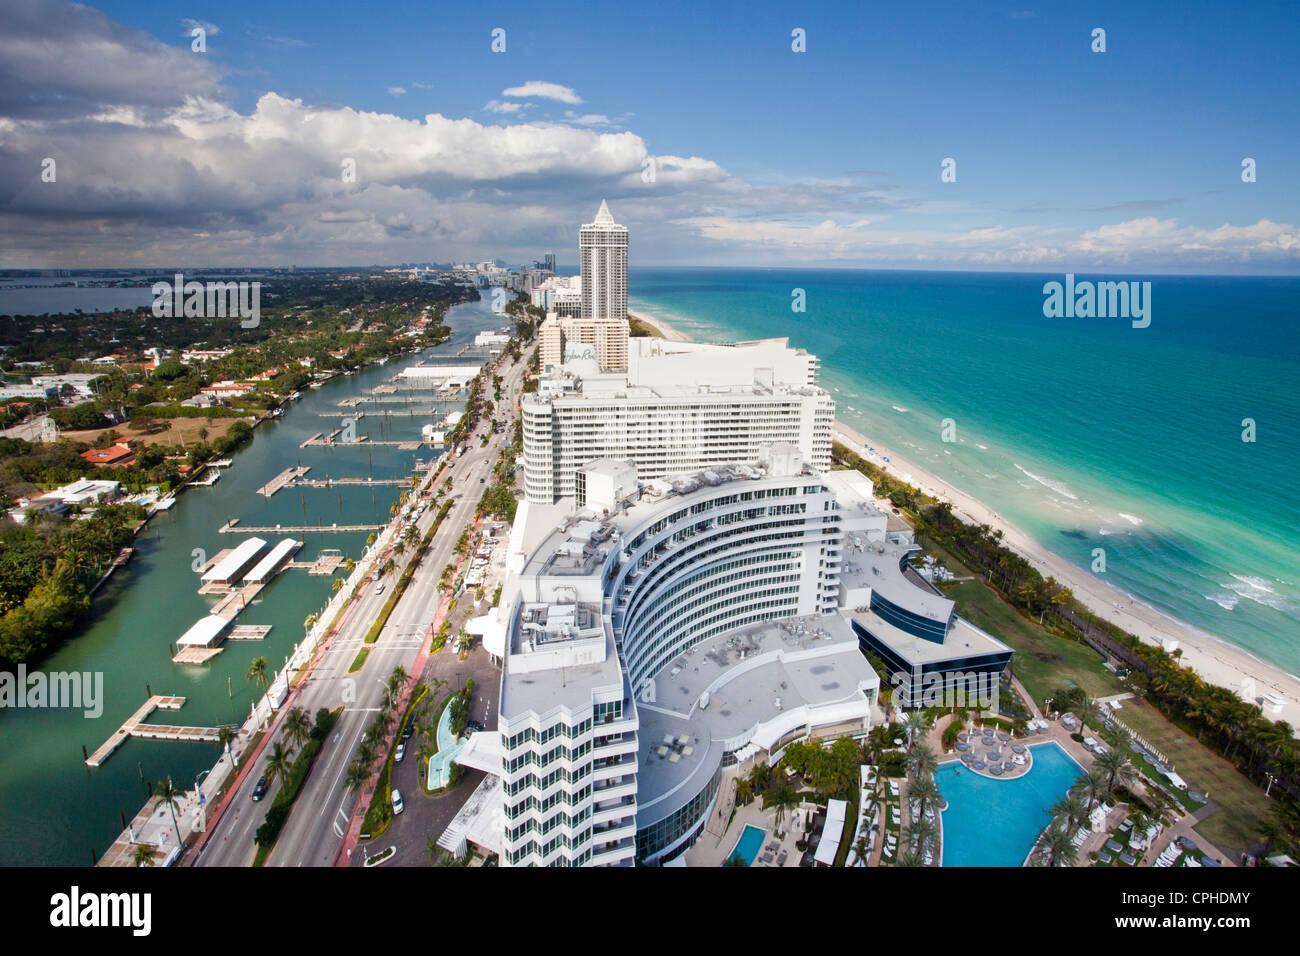 Stock photo usa united states america florida miami water architecture beach blue emerald famous hotels island long sea touri